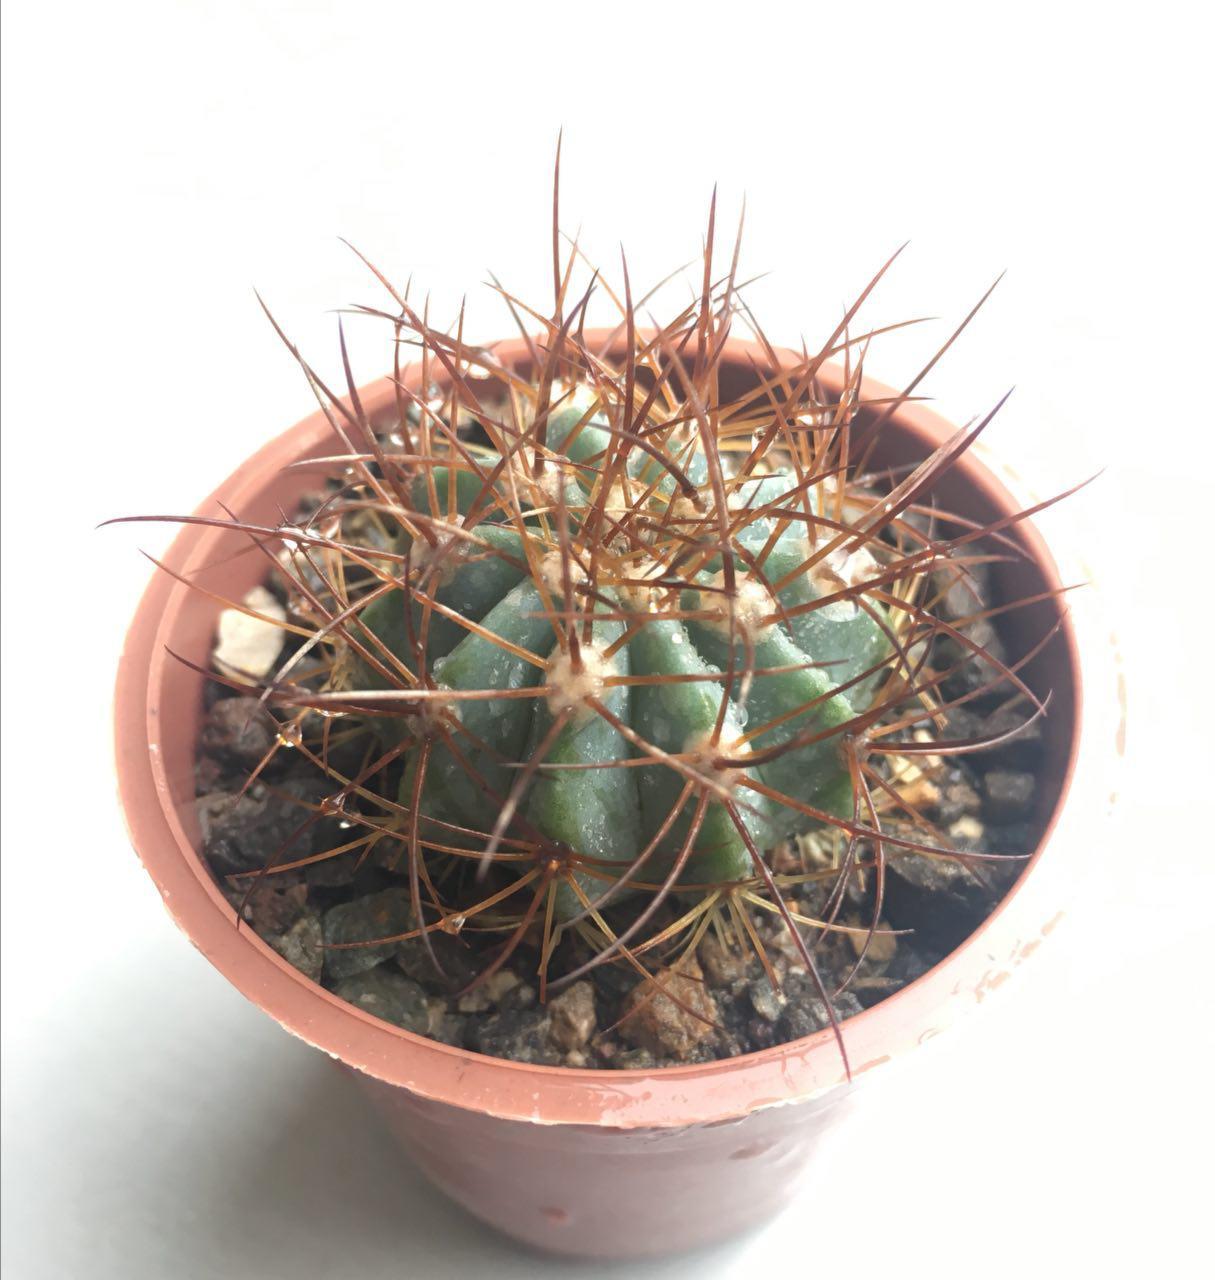 کاکتوس ملو آبی گلدان شش Blue Melocactus فروشگاه کاکتوس کهربا